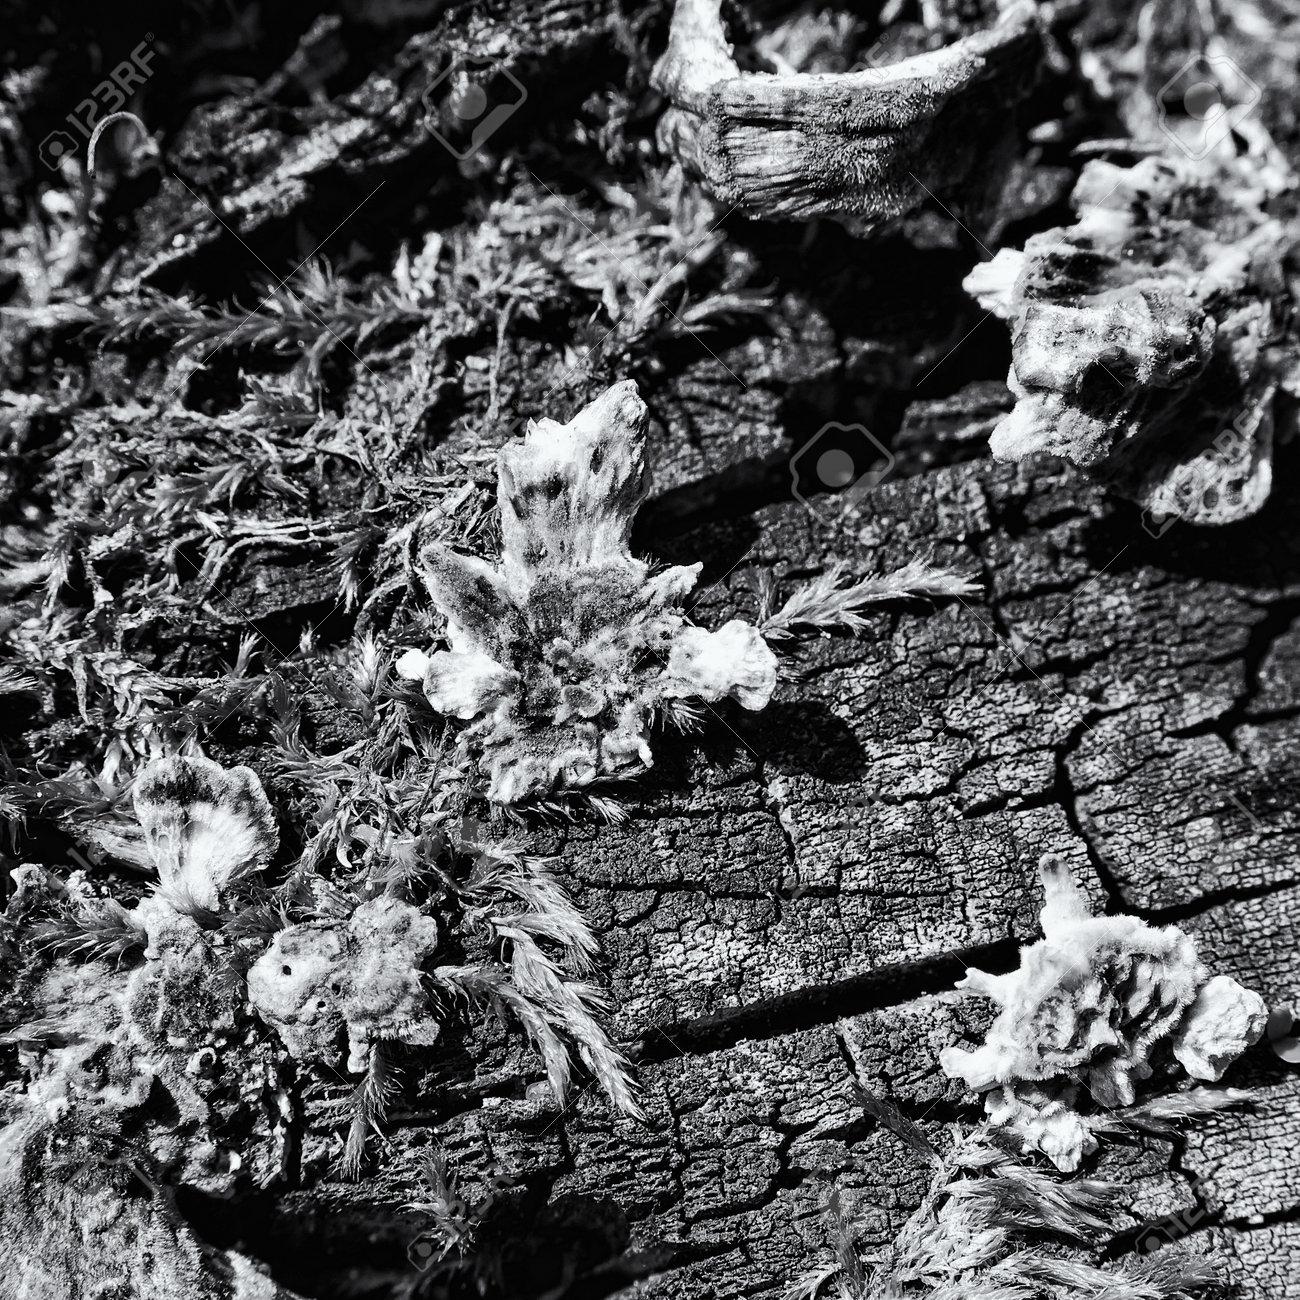 HUBS - Mushrooms on a dead tree trunk - 169541108